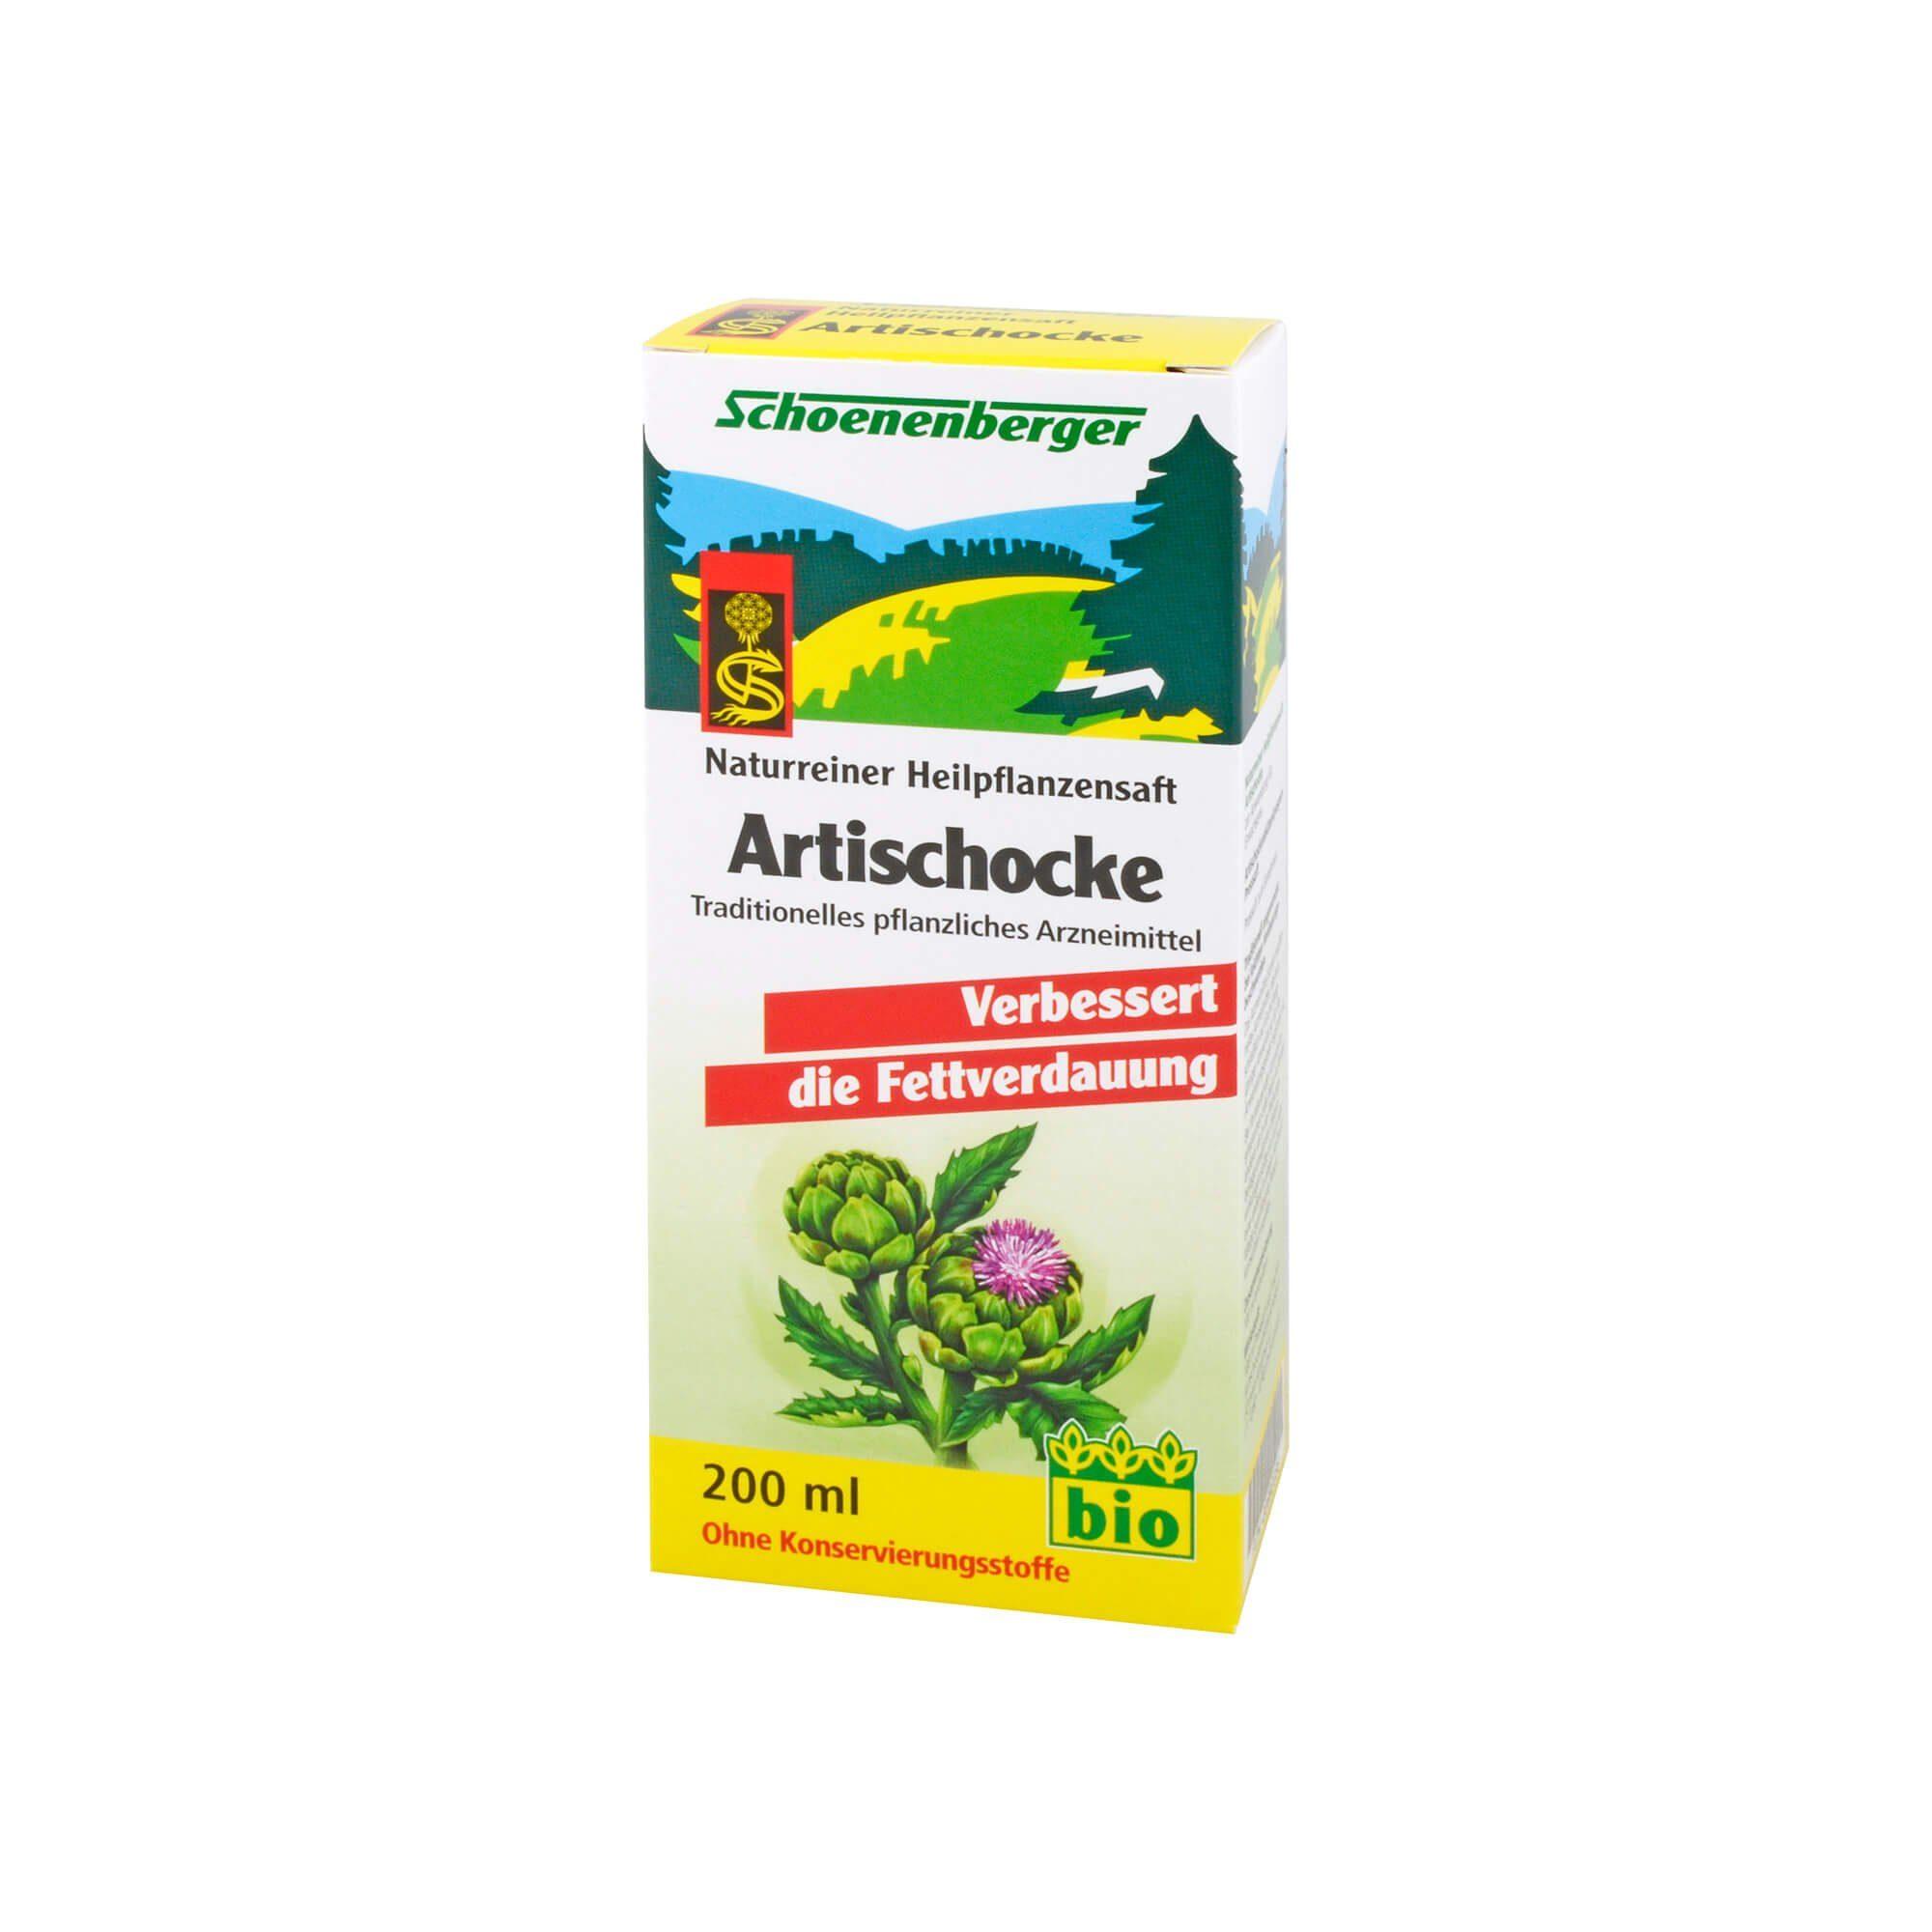 Artischockensaft Schoenenberger, 200 ml